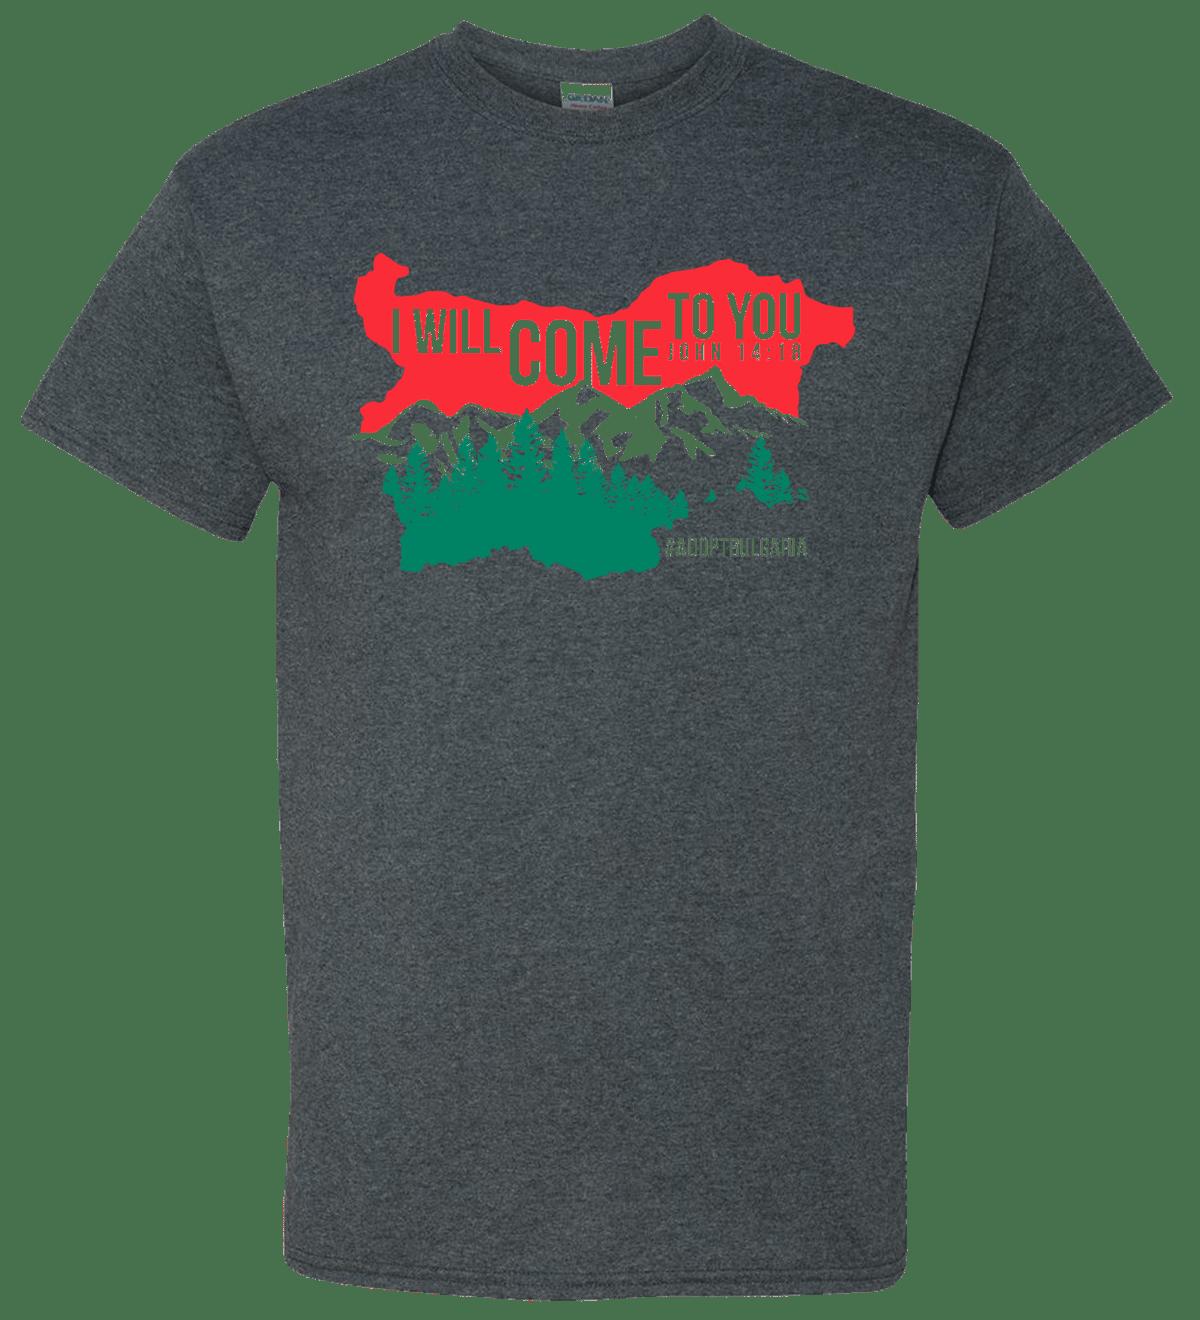 Image of #AdoptBulgaria T-Shirt